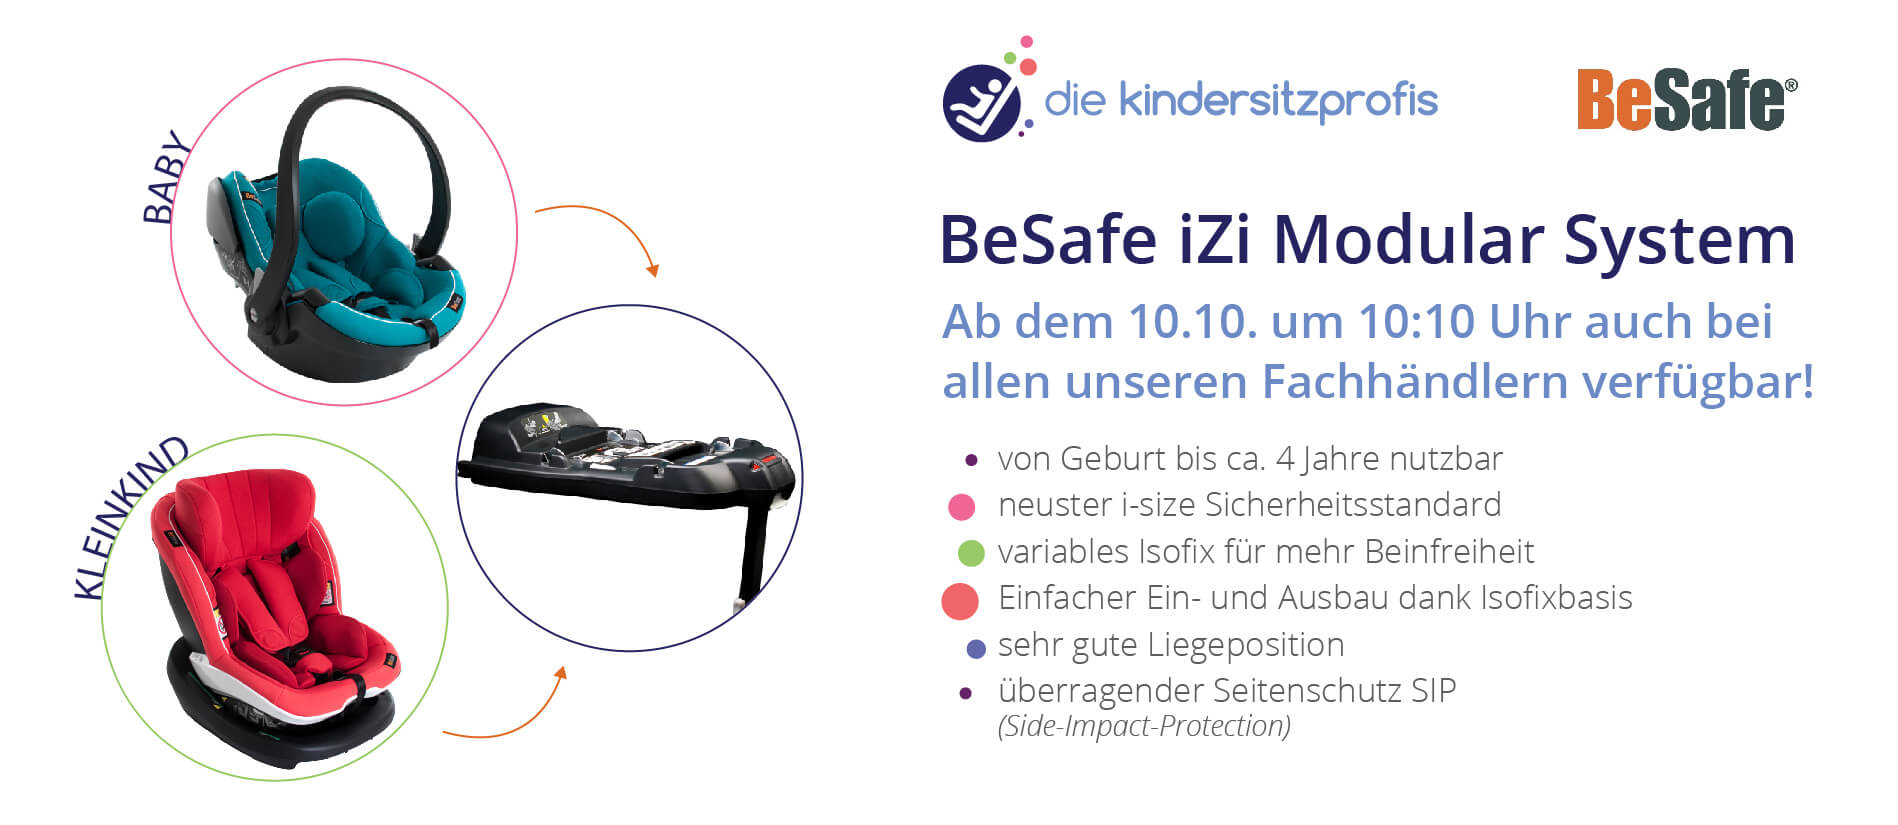 Ab 10.10. bei den Kindersitzprofis: Das BeSafe iZi Modular System